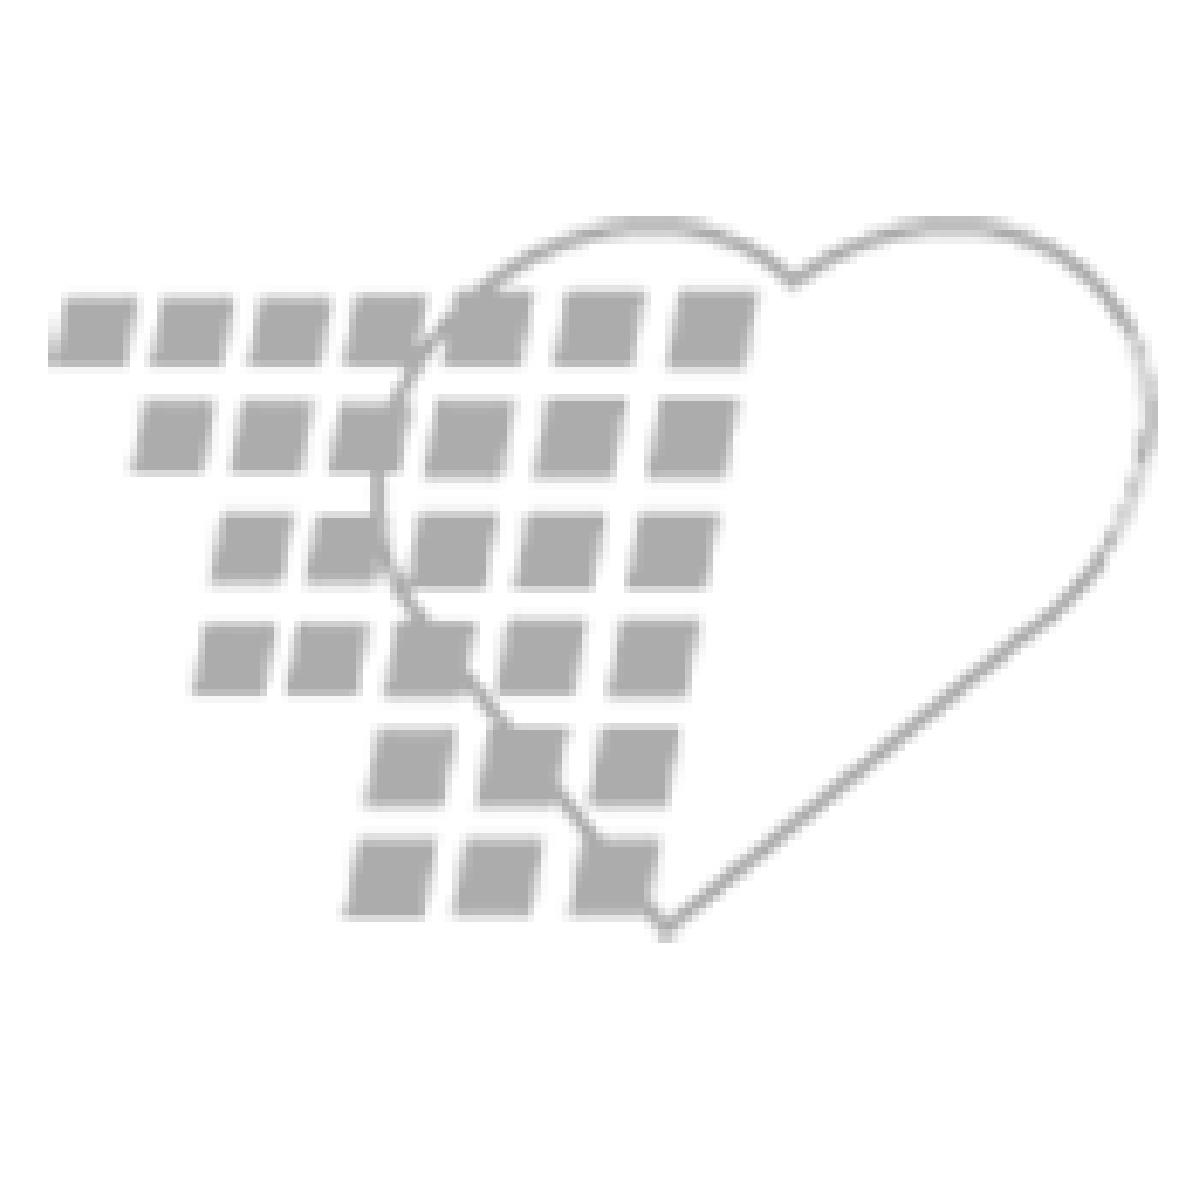 06-93-1060-1000ML - Demo Dose® 0.45% NaCl IV Fluids